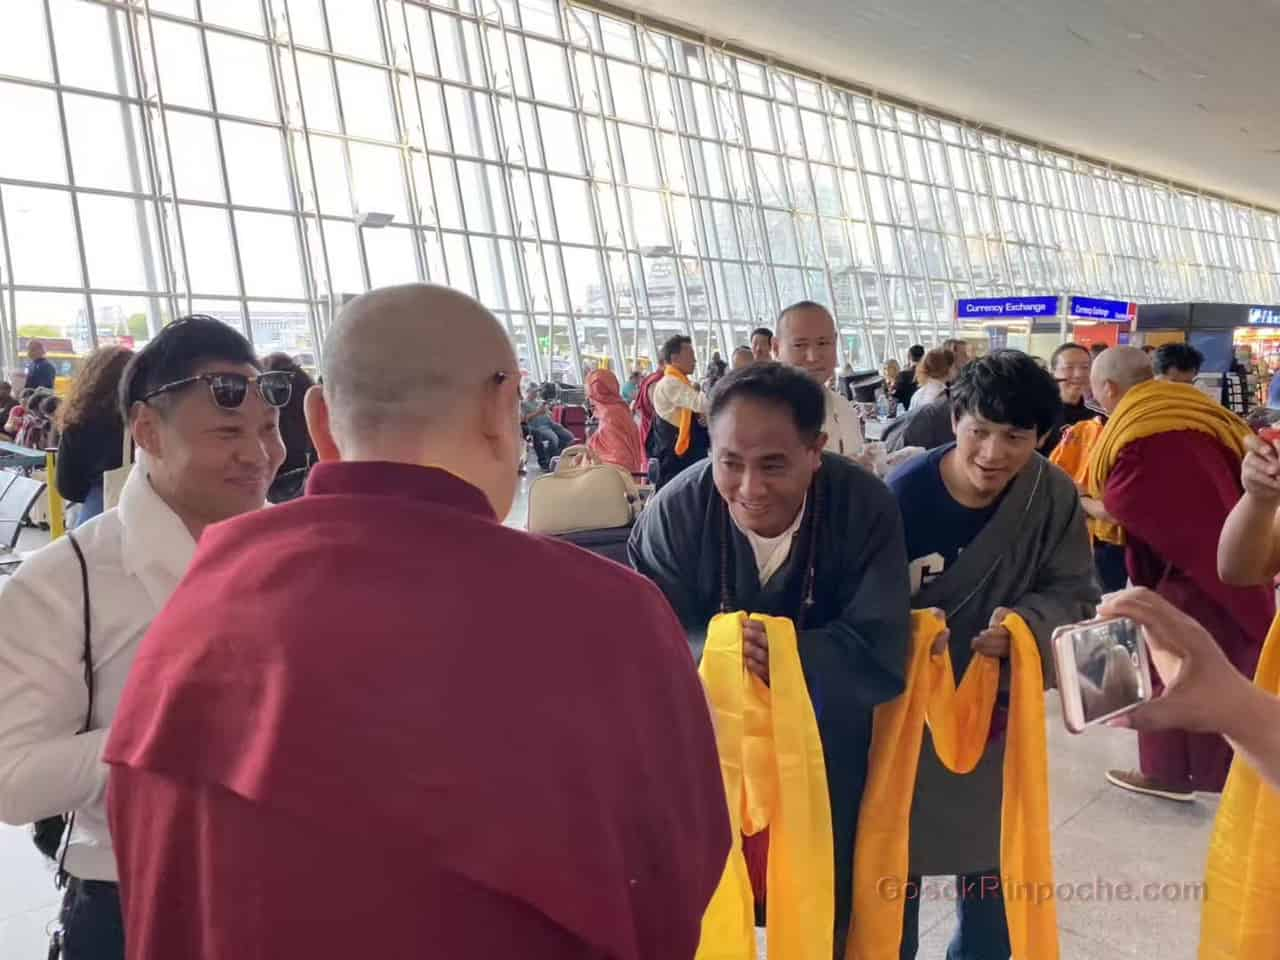 Gosok Rinpoche NYC airport 20190926184804